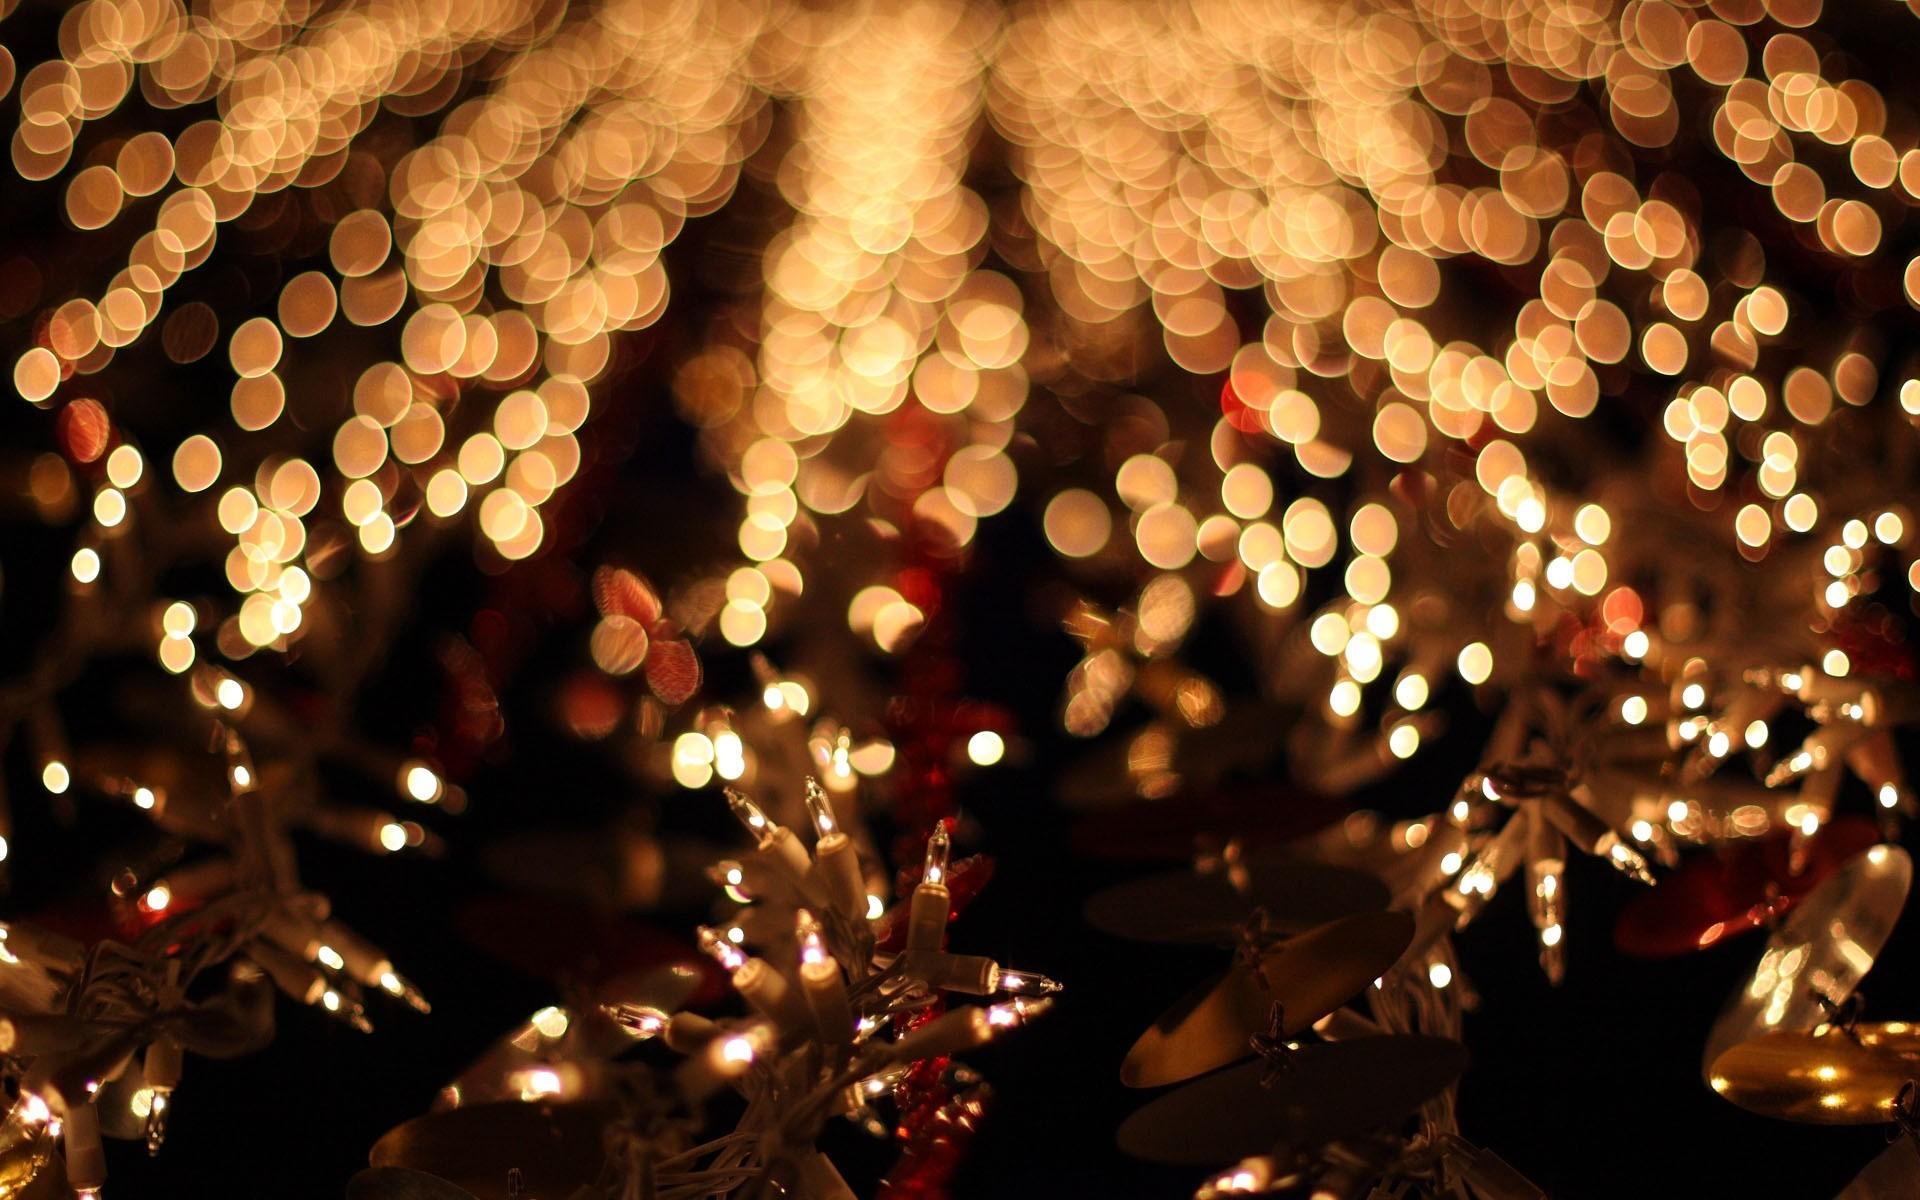 Christmas Lights Bokeh Wallpaper 2694 Umad Com. home office  decorating ideas. cheap home …